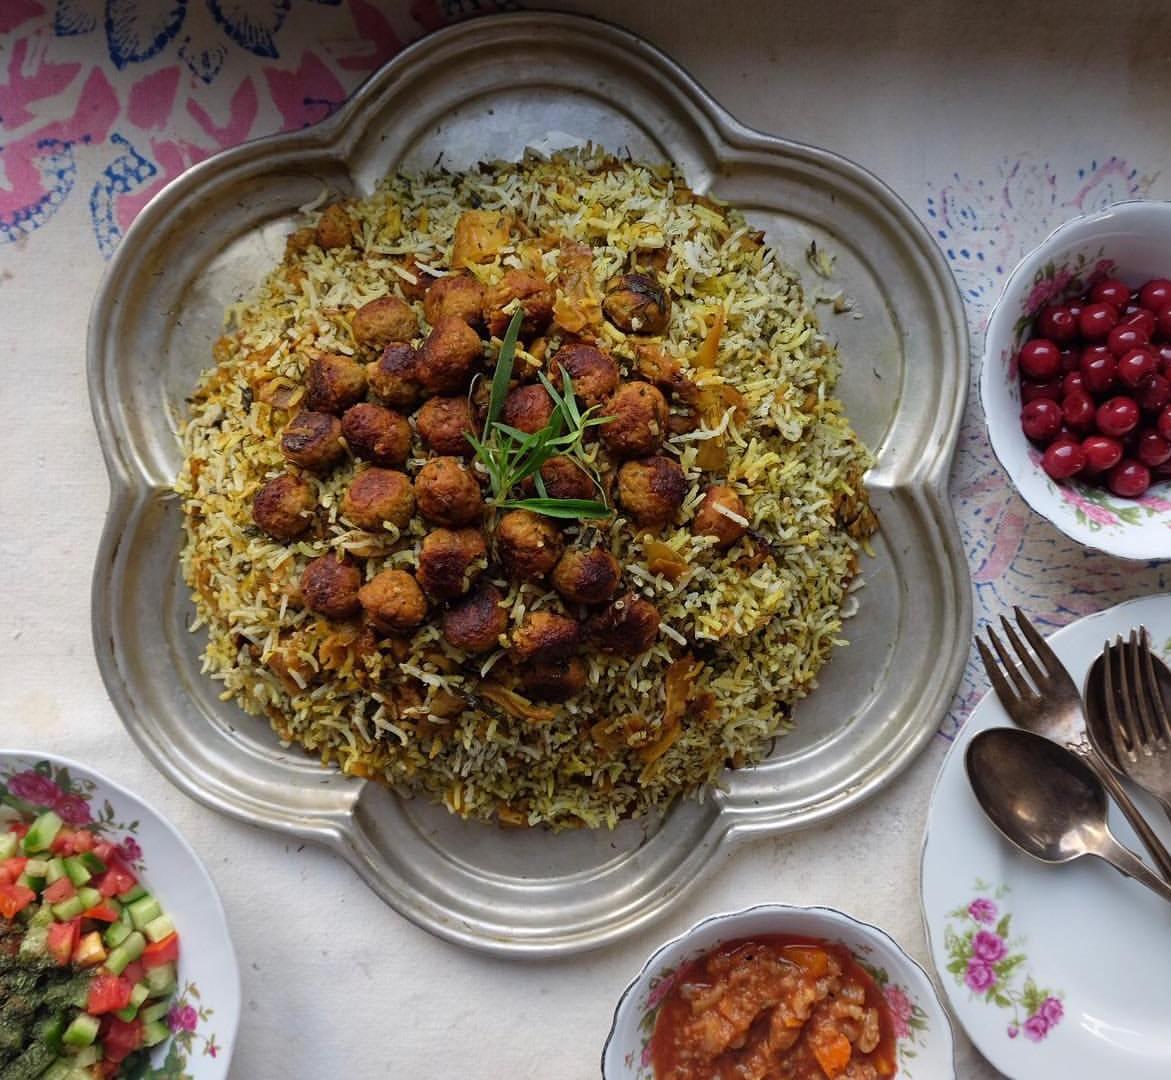 Kalam Polo (Kohlrabi, rice, meatballs, spices), with the Side of Salad Shirazi